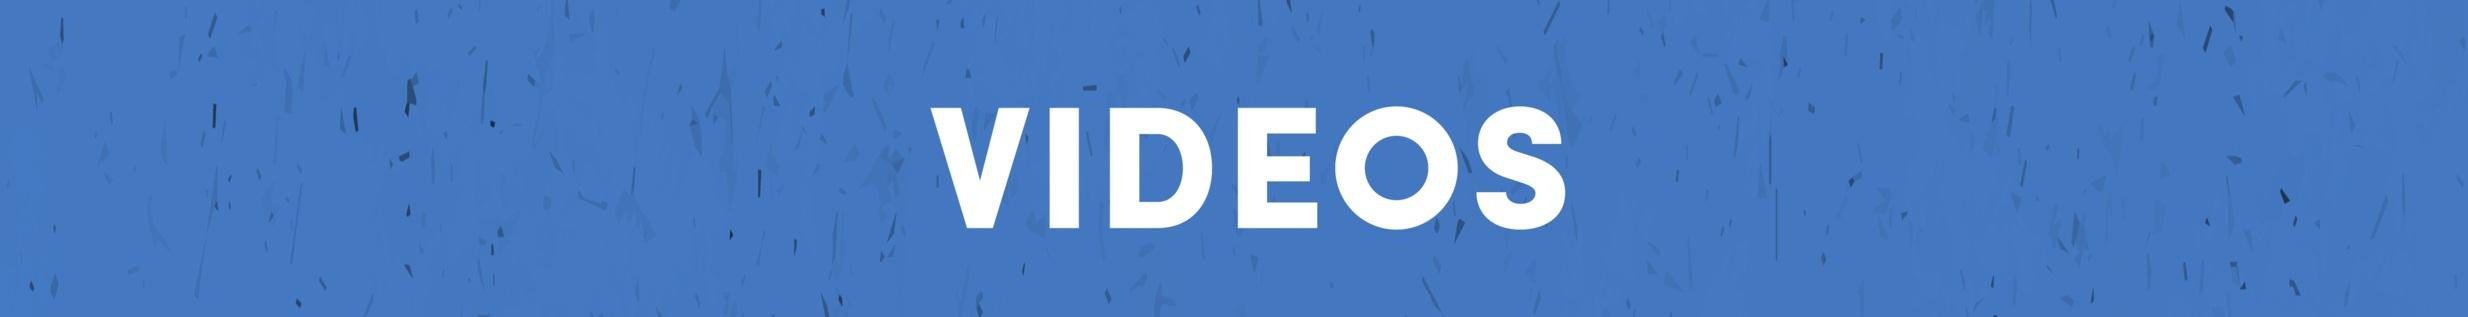 videos4.jpg